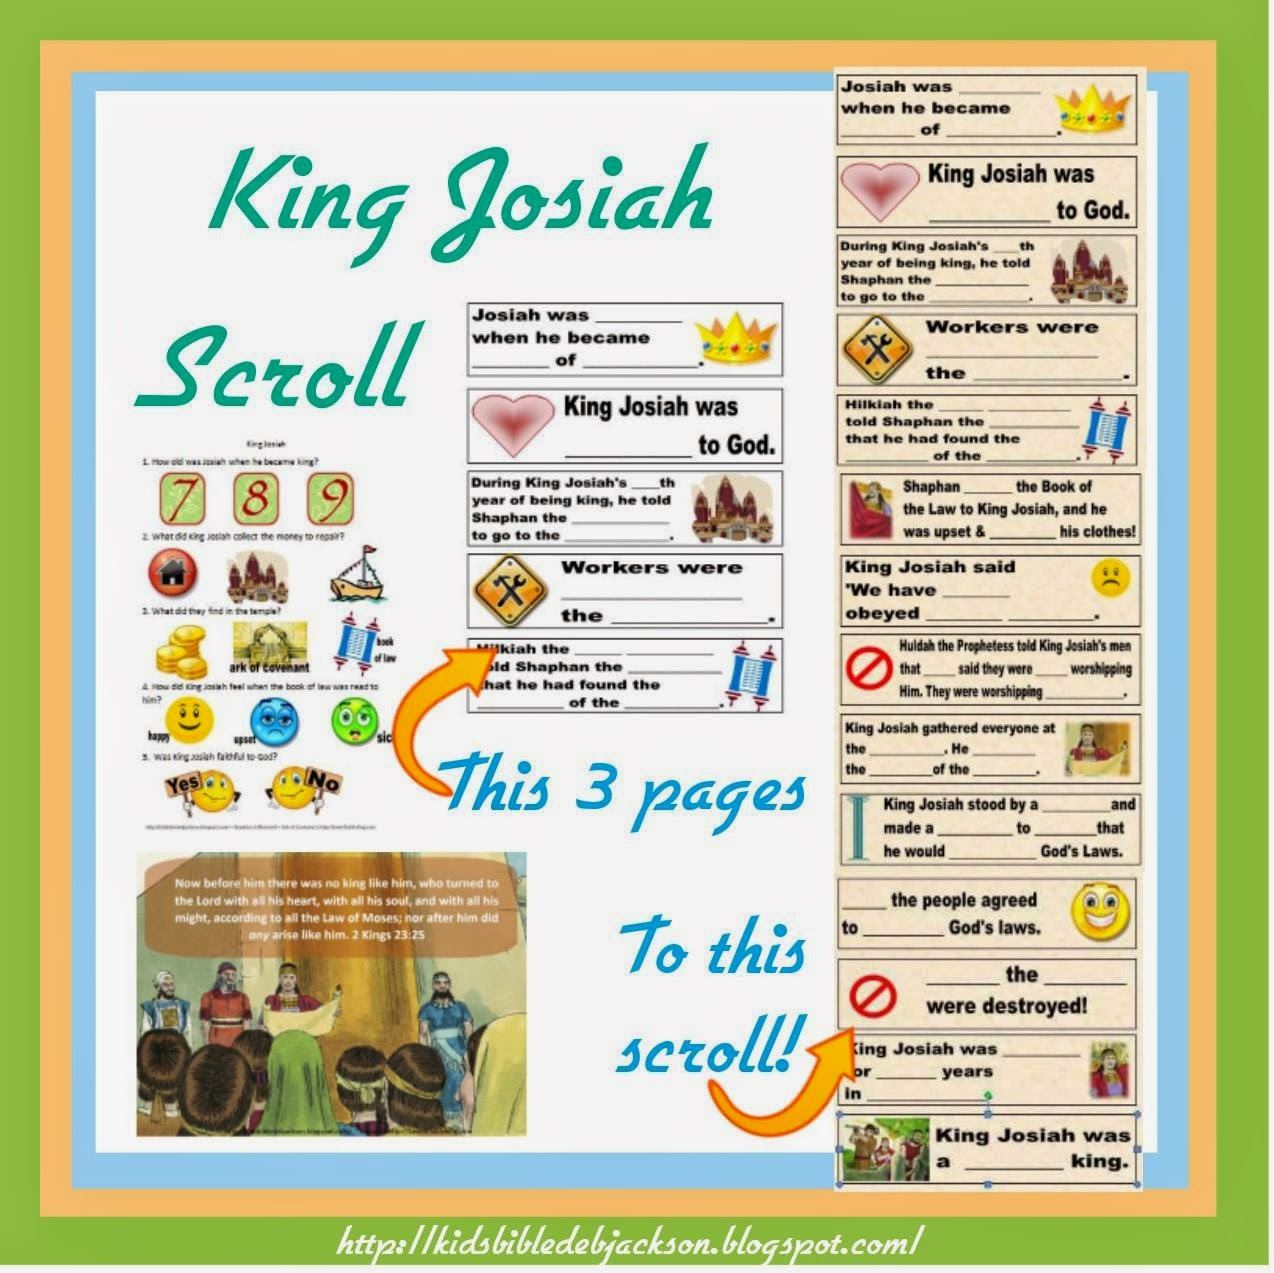 Free coloring pages king josiah - Free Coloring Pages King Josiah 13